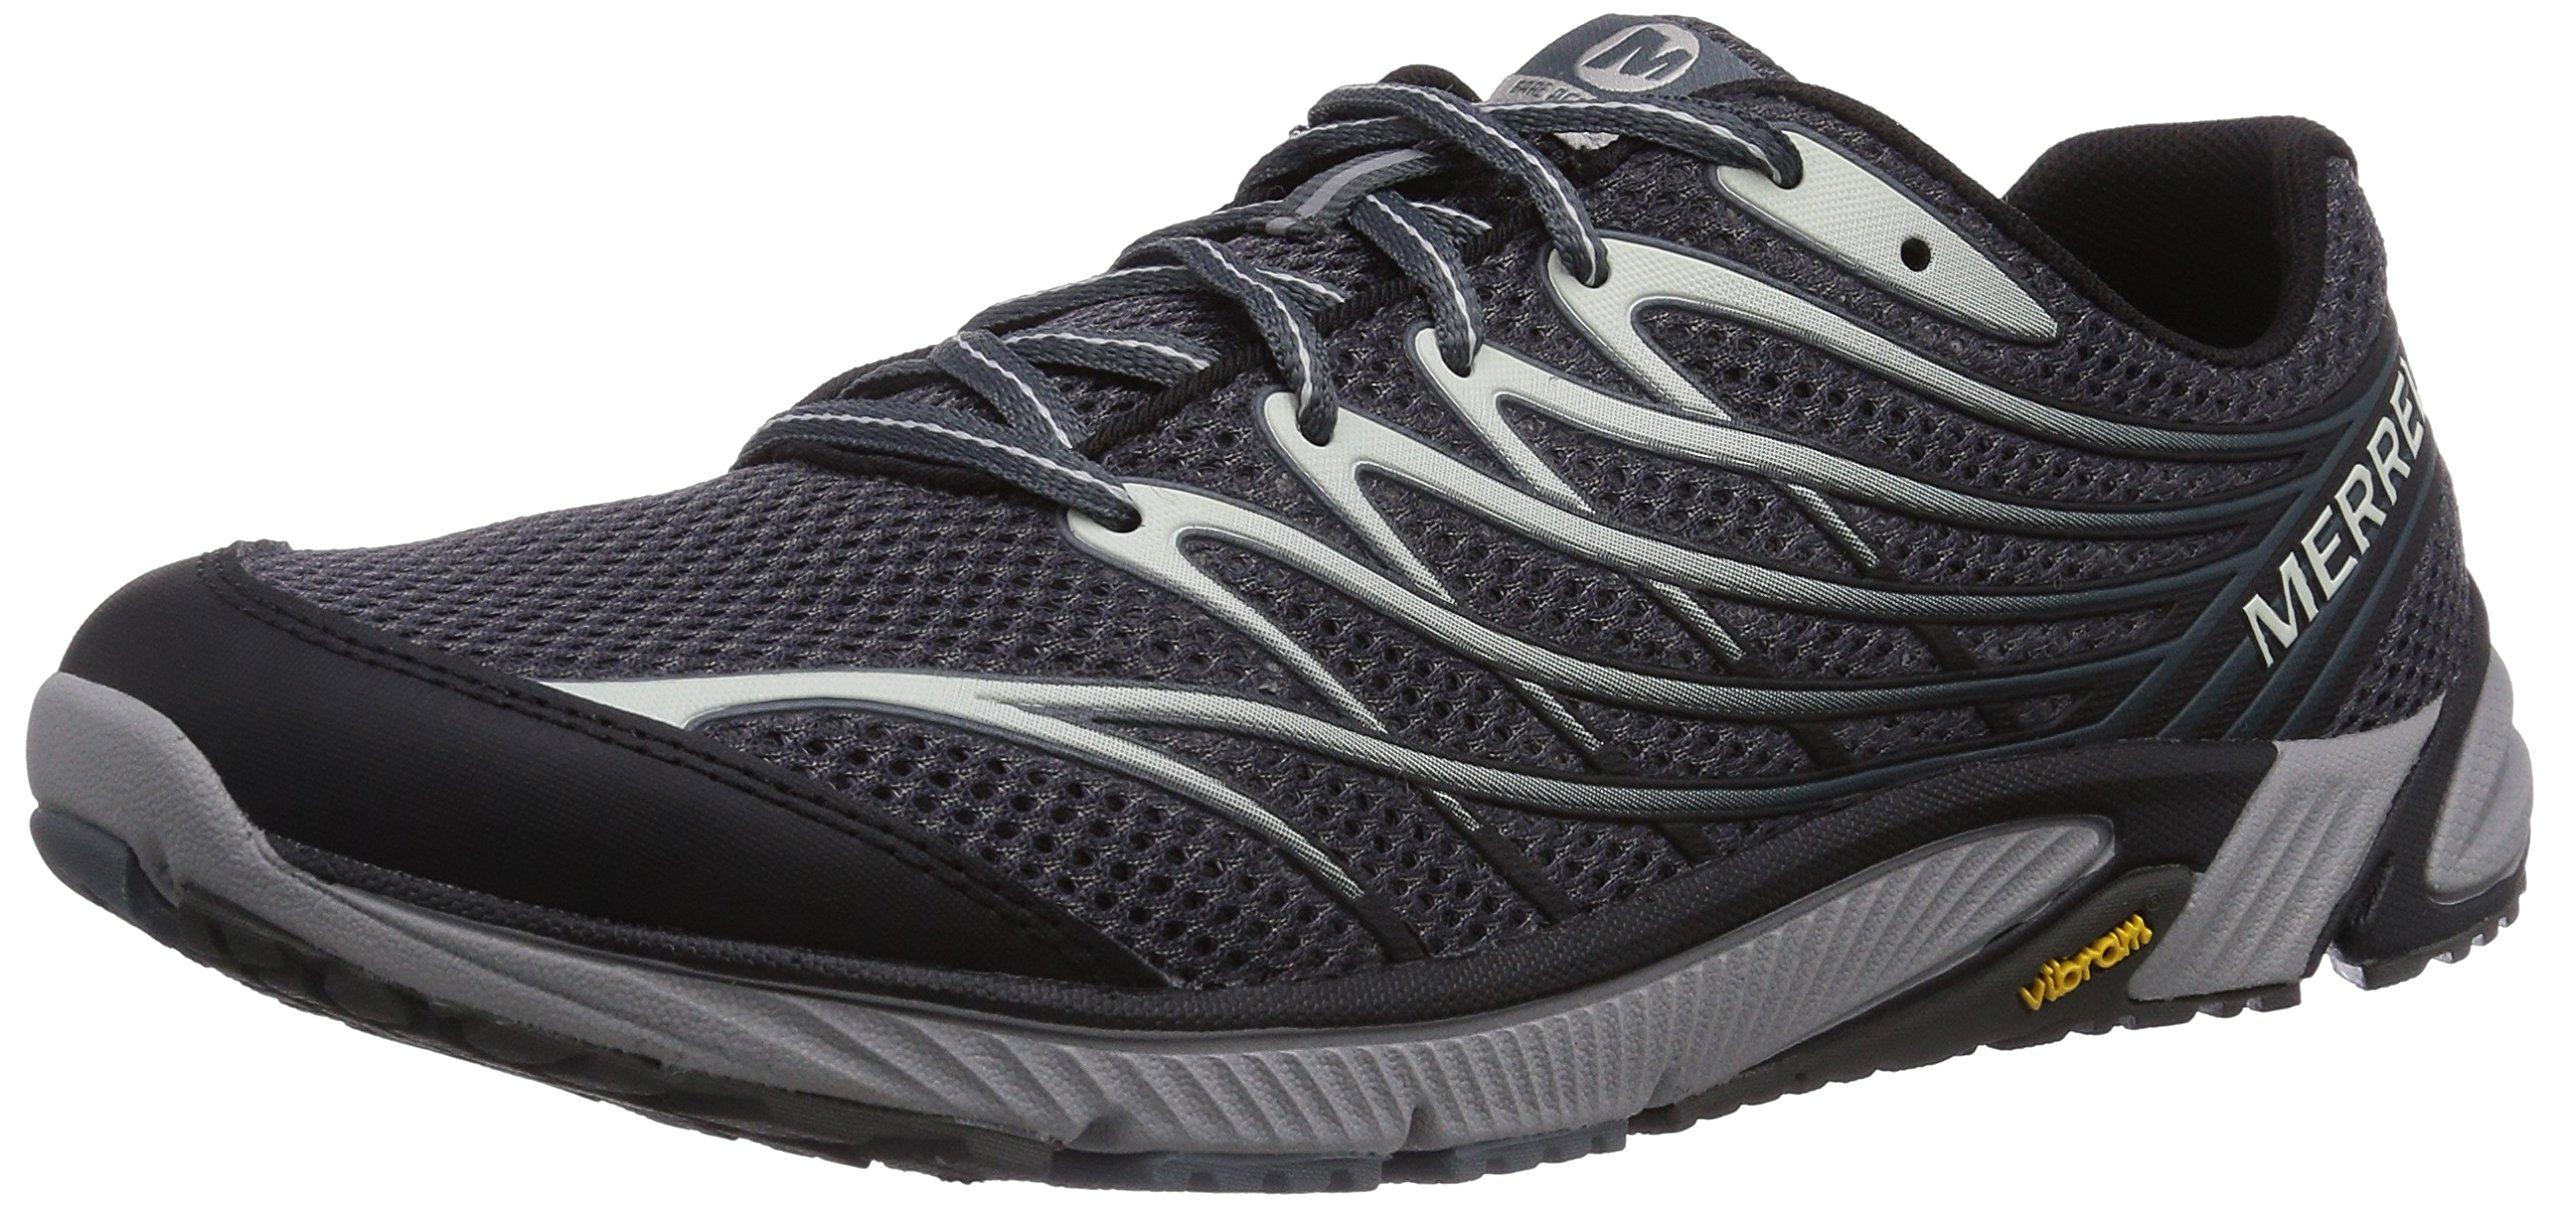 Merrell Men's Bare Access 4 Trail Running Shoe, Black/Dark Grey, 11.5 M US